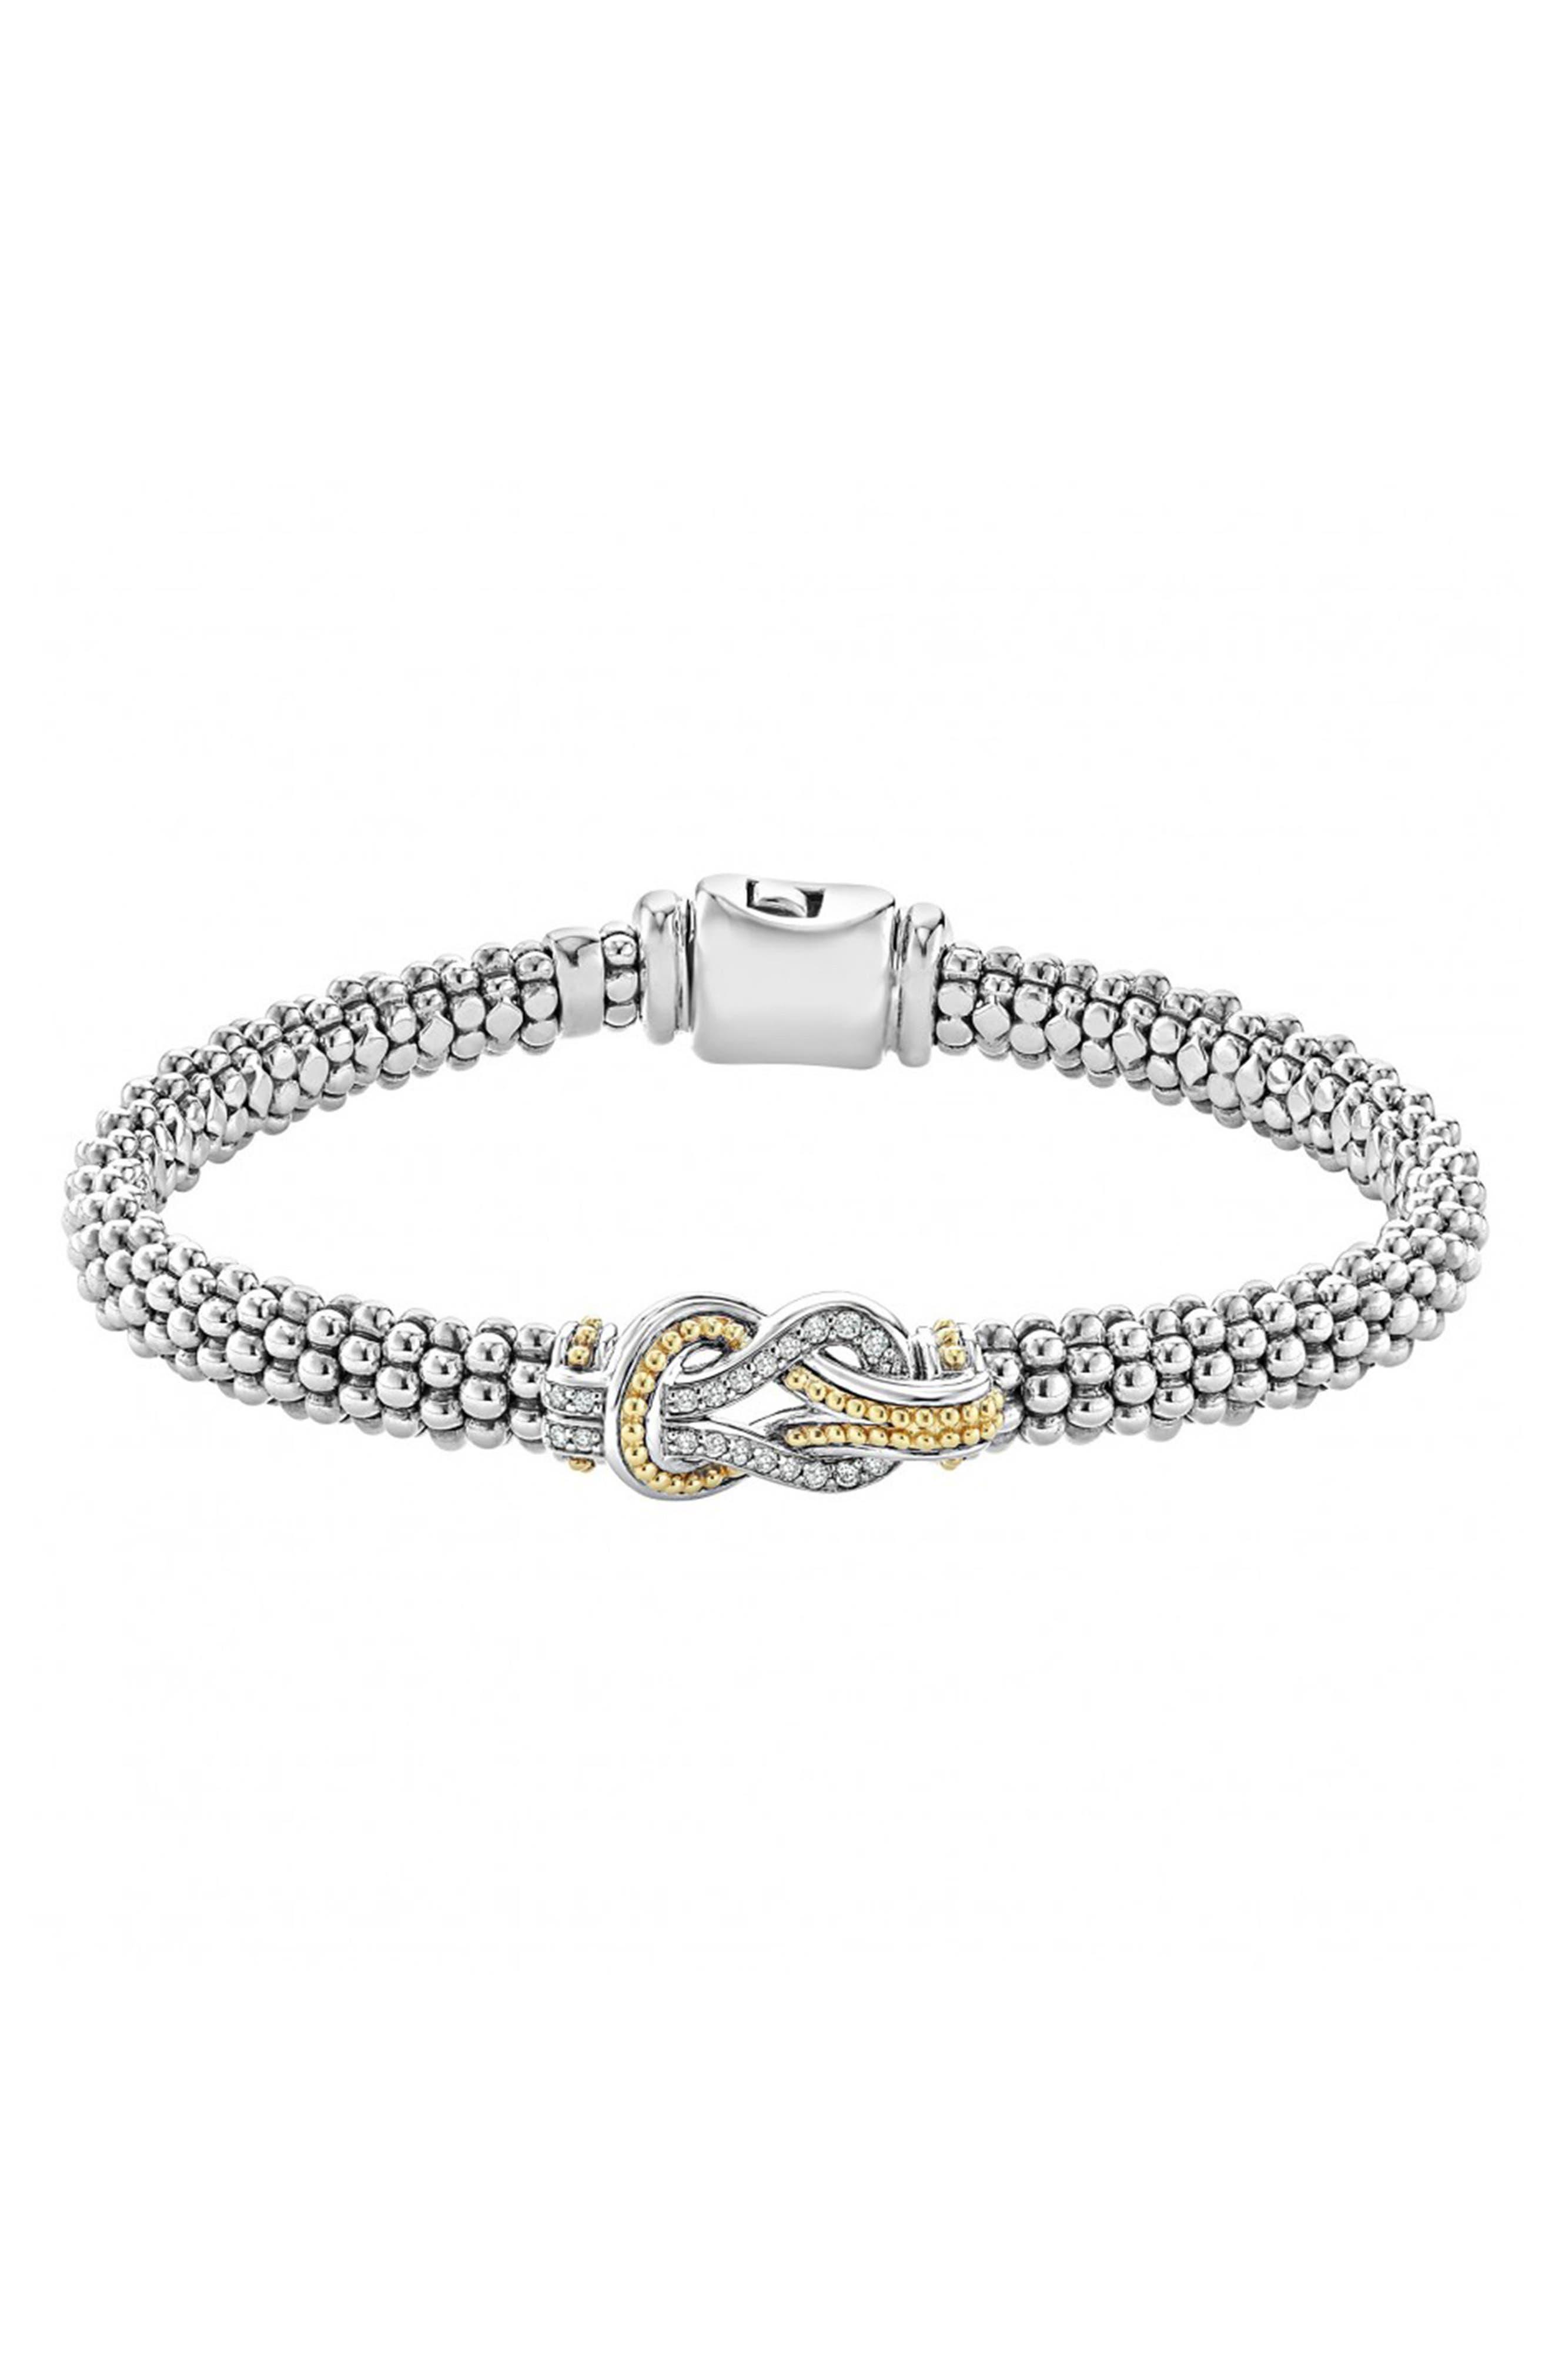 'Newport' Diamond Knot Bracelet,                             Main thumbnail 1, color,                             SILVER/ GOLD